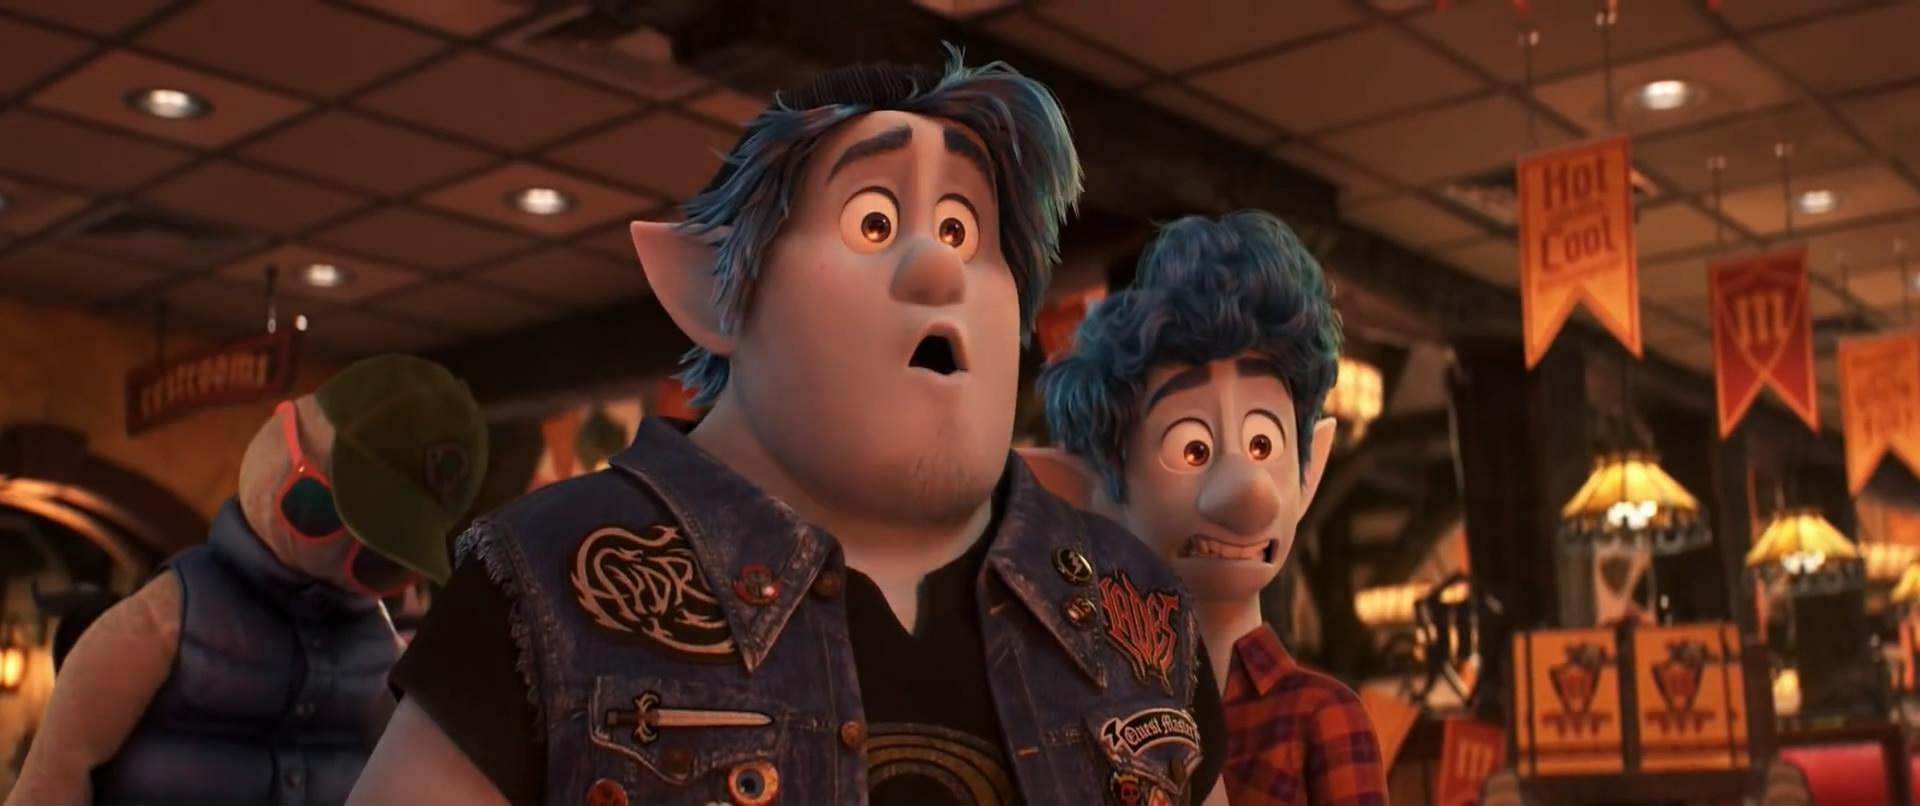 Chris Pratt and Tom Holland in Onward (2020)